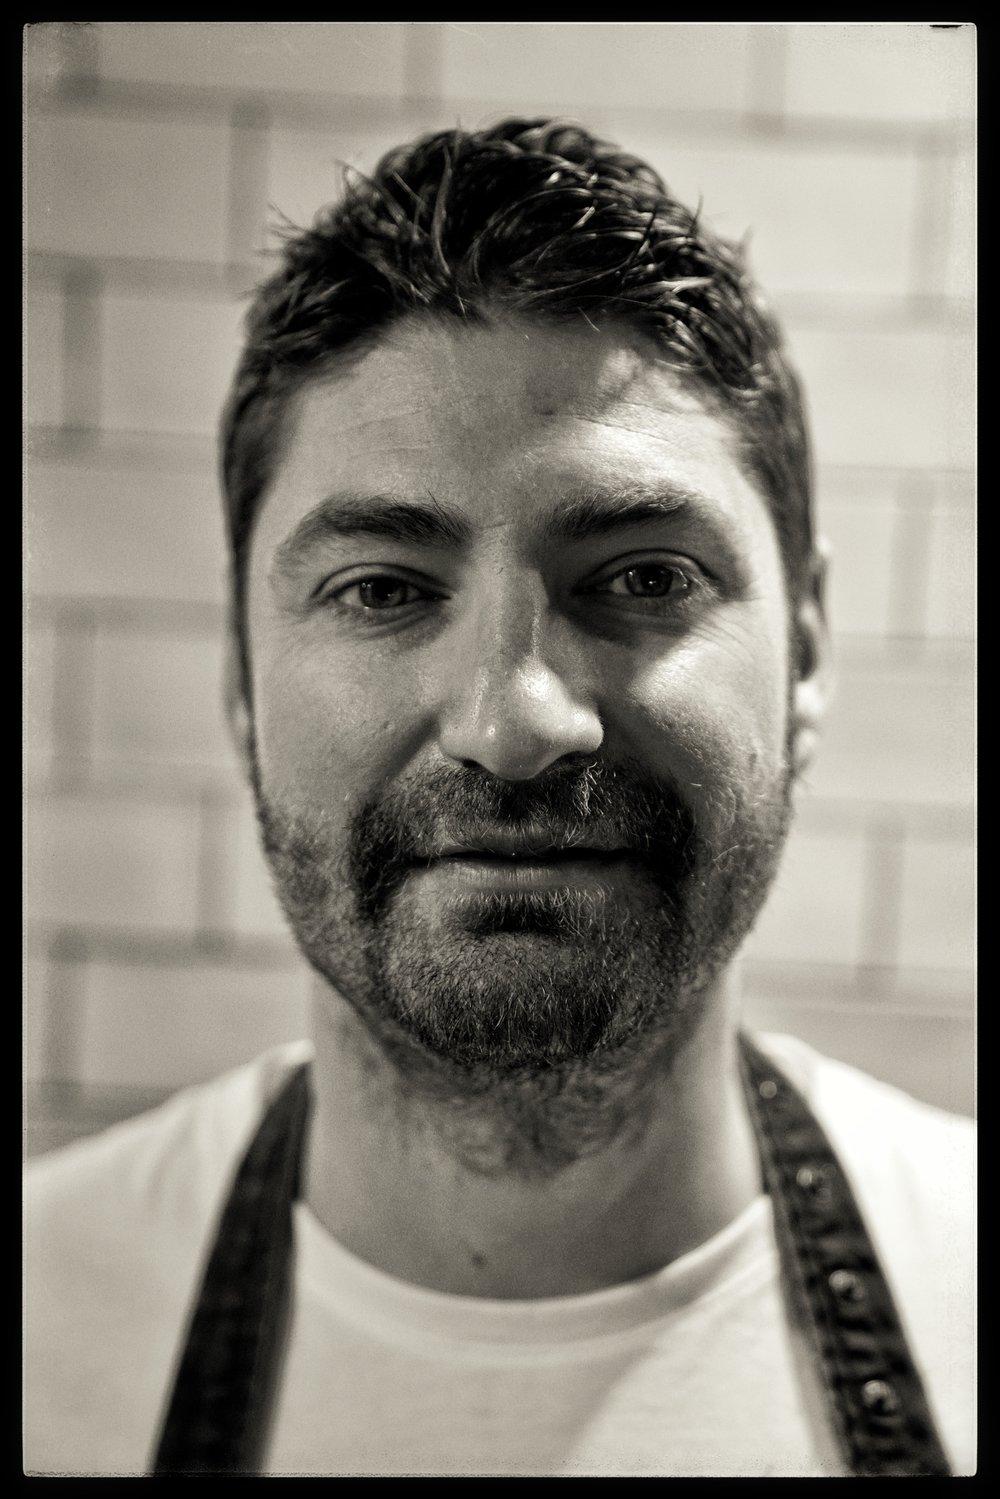 Jeffrey-DeRome-head-chef-no.1-bent-street-sydney